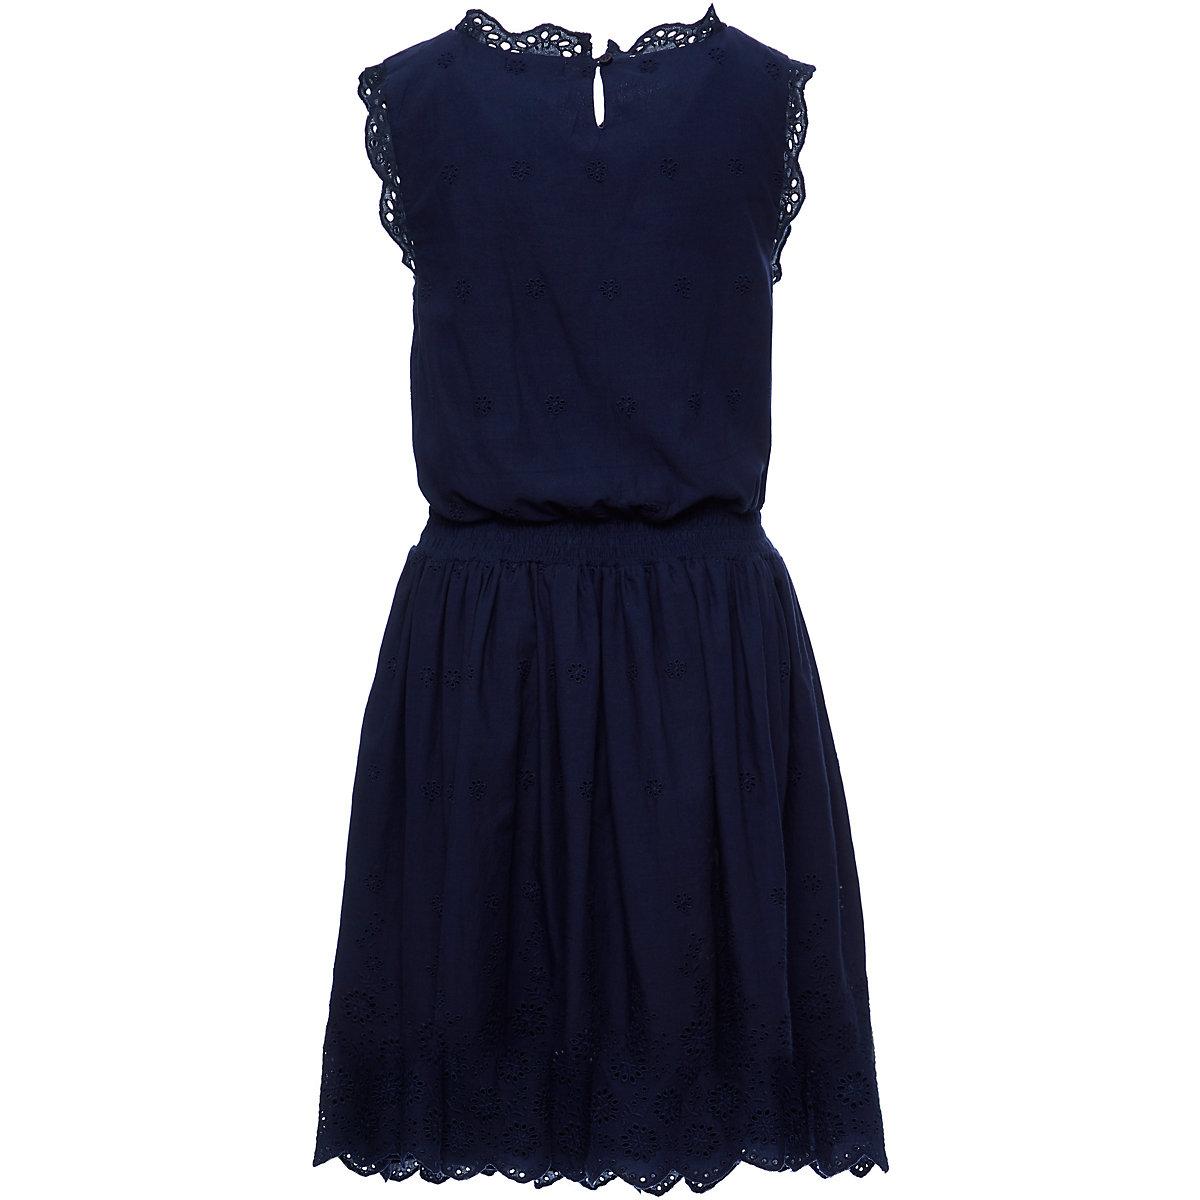 Kinder Kleid mit Lochstickerei, REVIEW for Teens | myToys